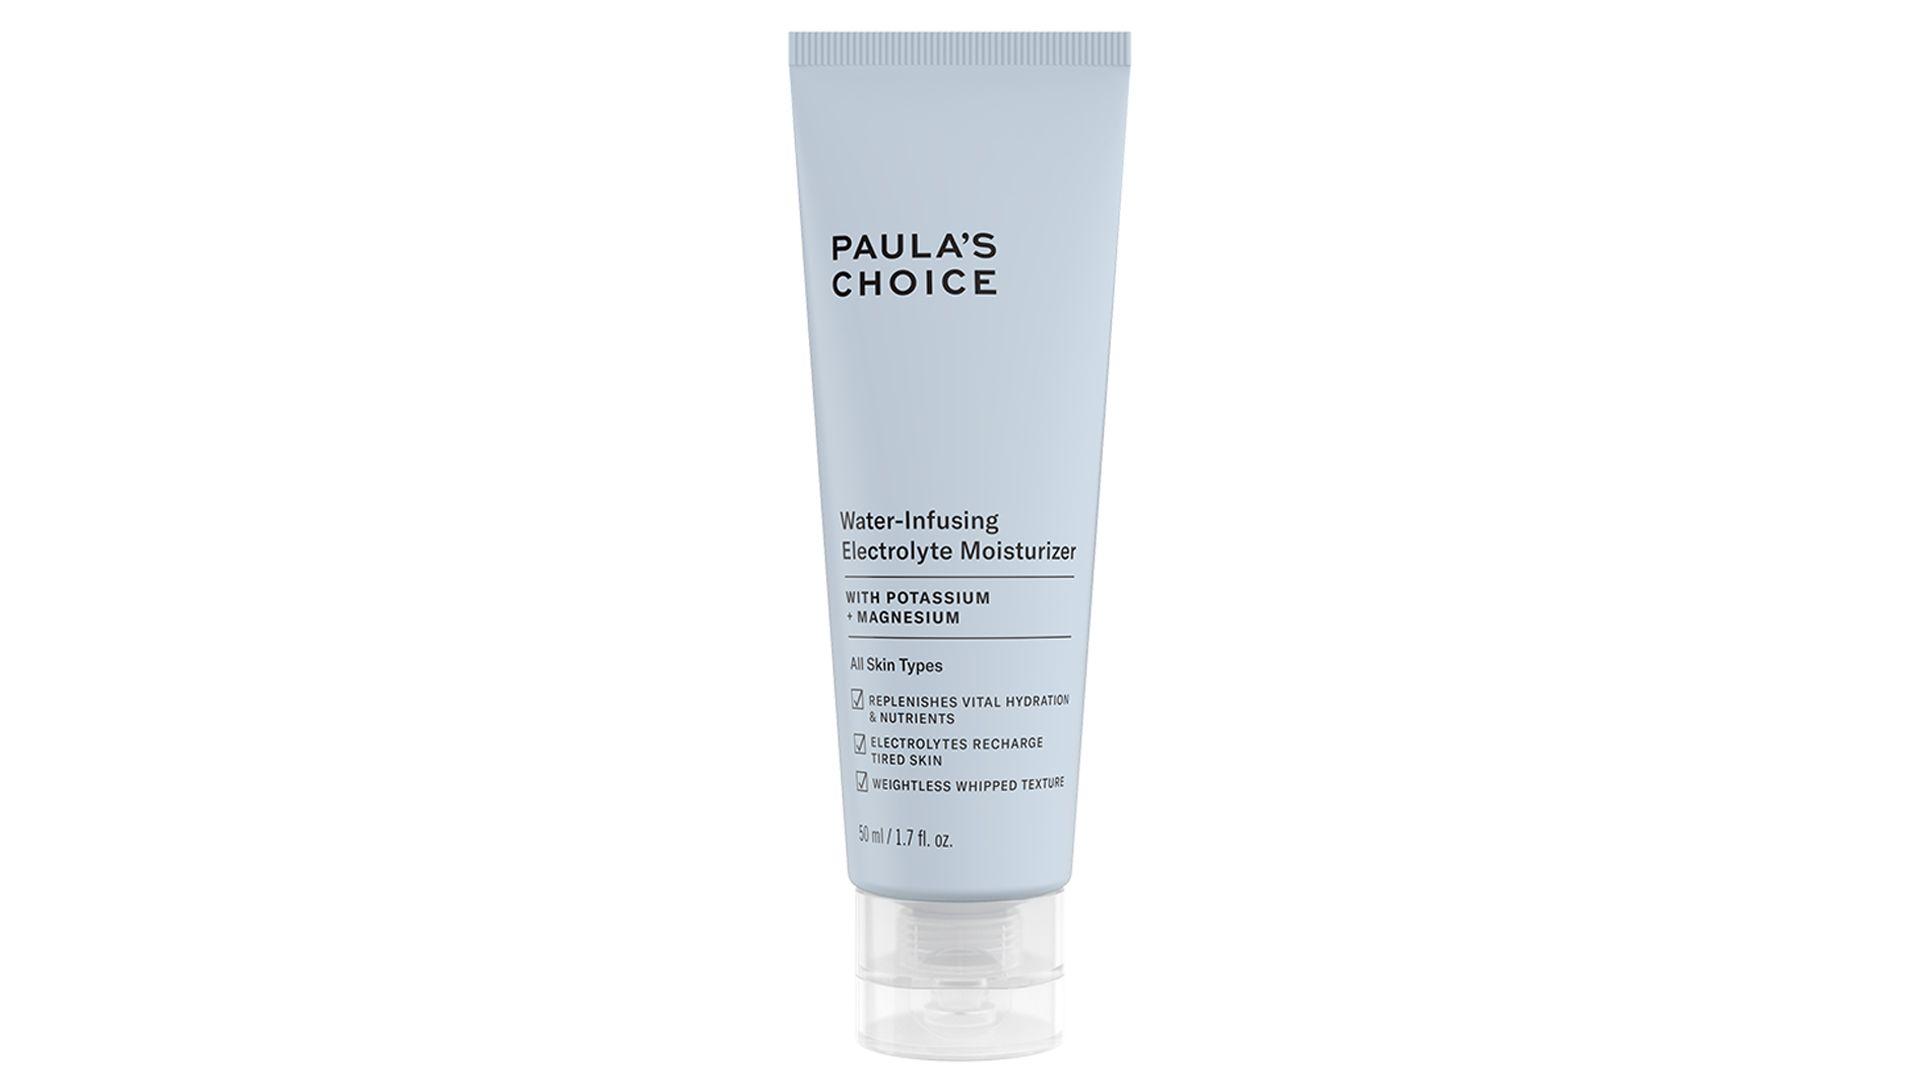 Paula's Choice -Water-Infusing Electrolyte Moisturizer